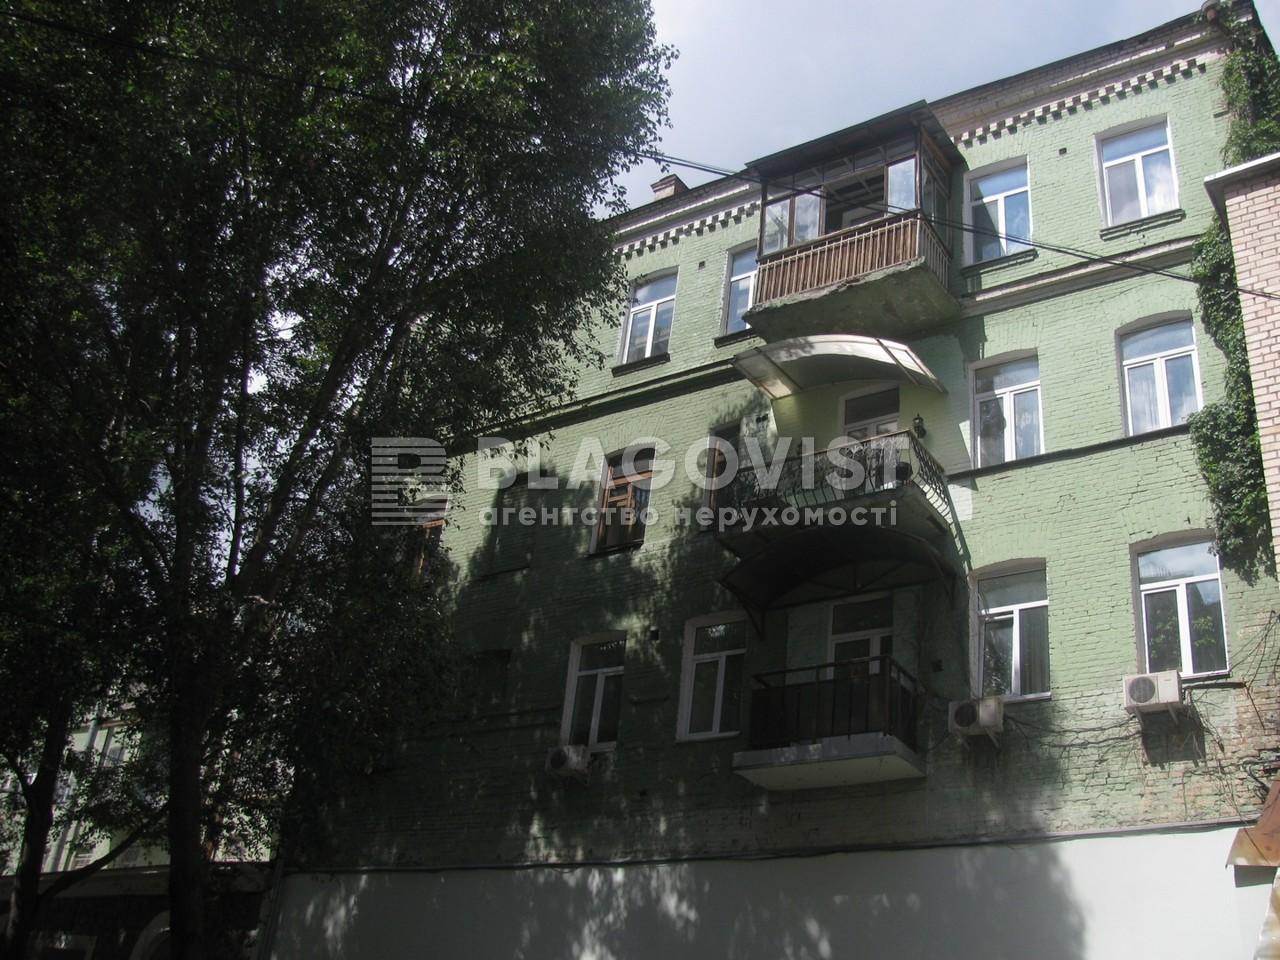 Квартира A-79992, Пушкінська, 9б, Київ - Фото 1